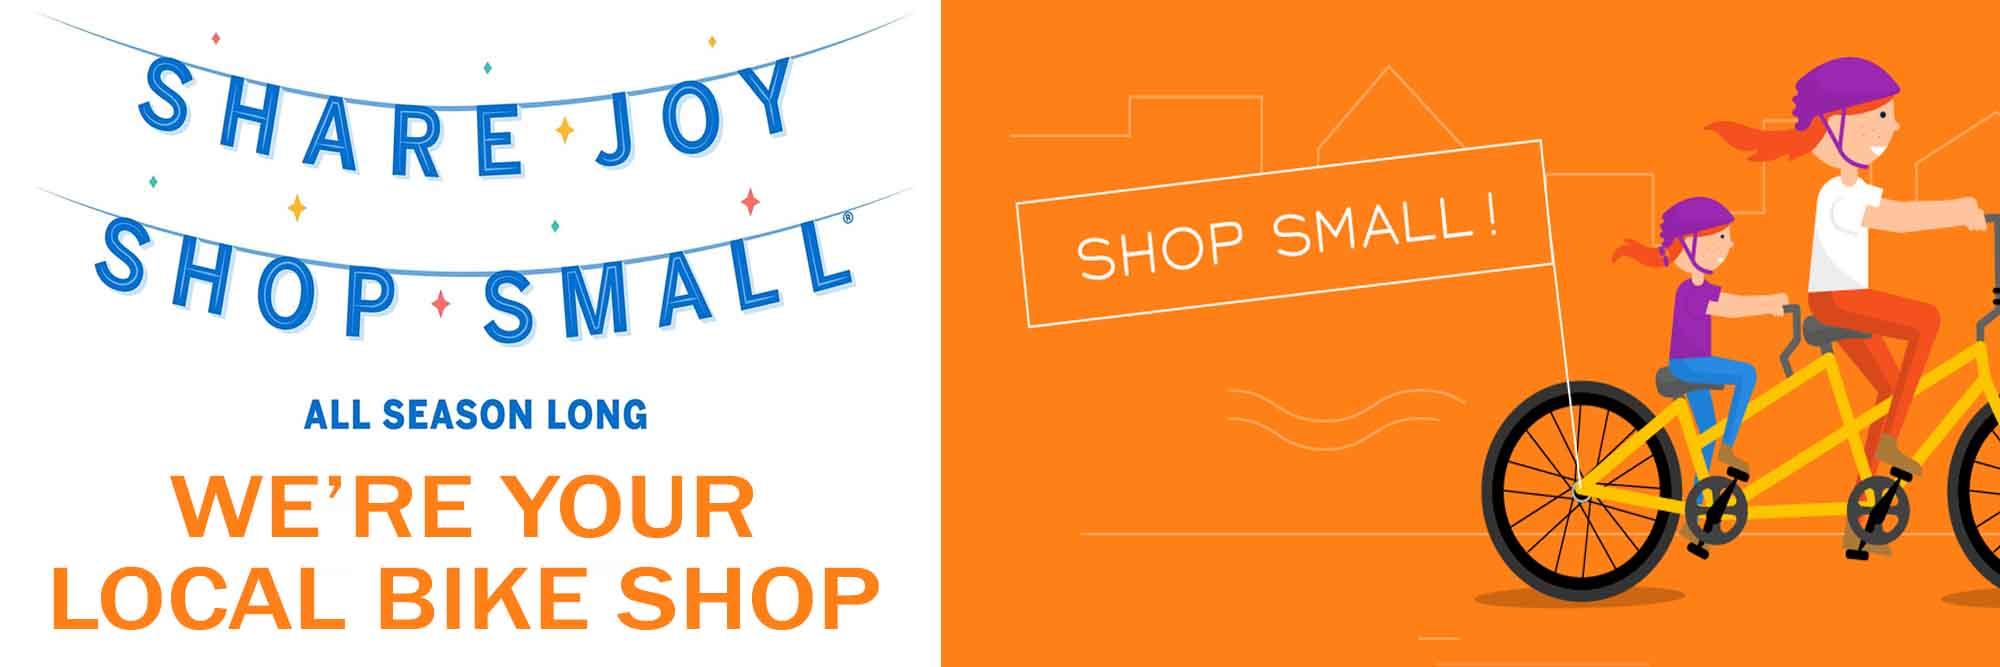 Shop Small, Shop Local this Season